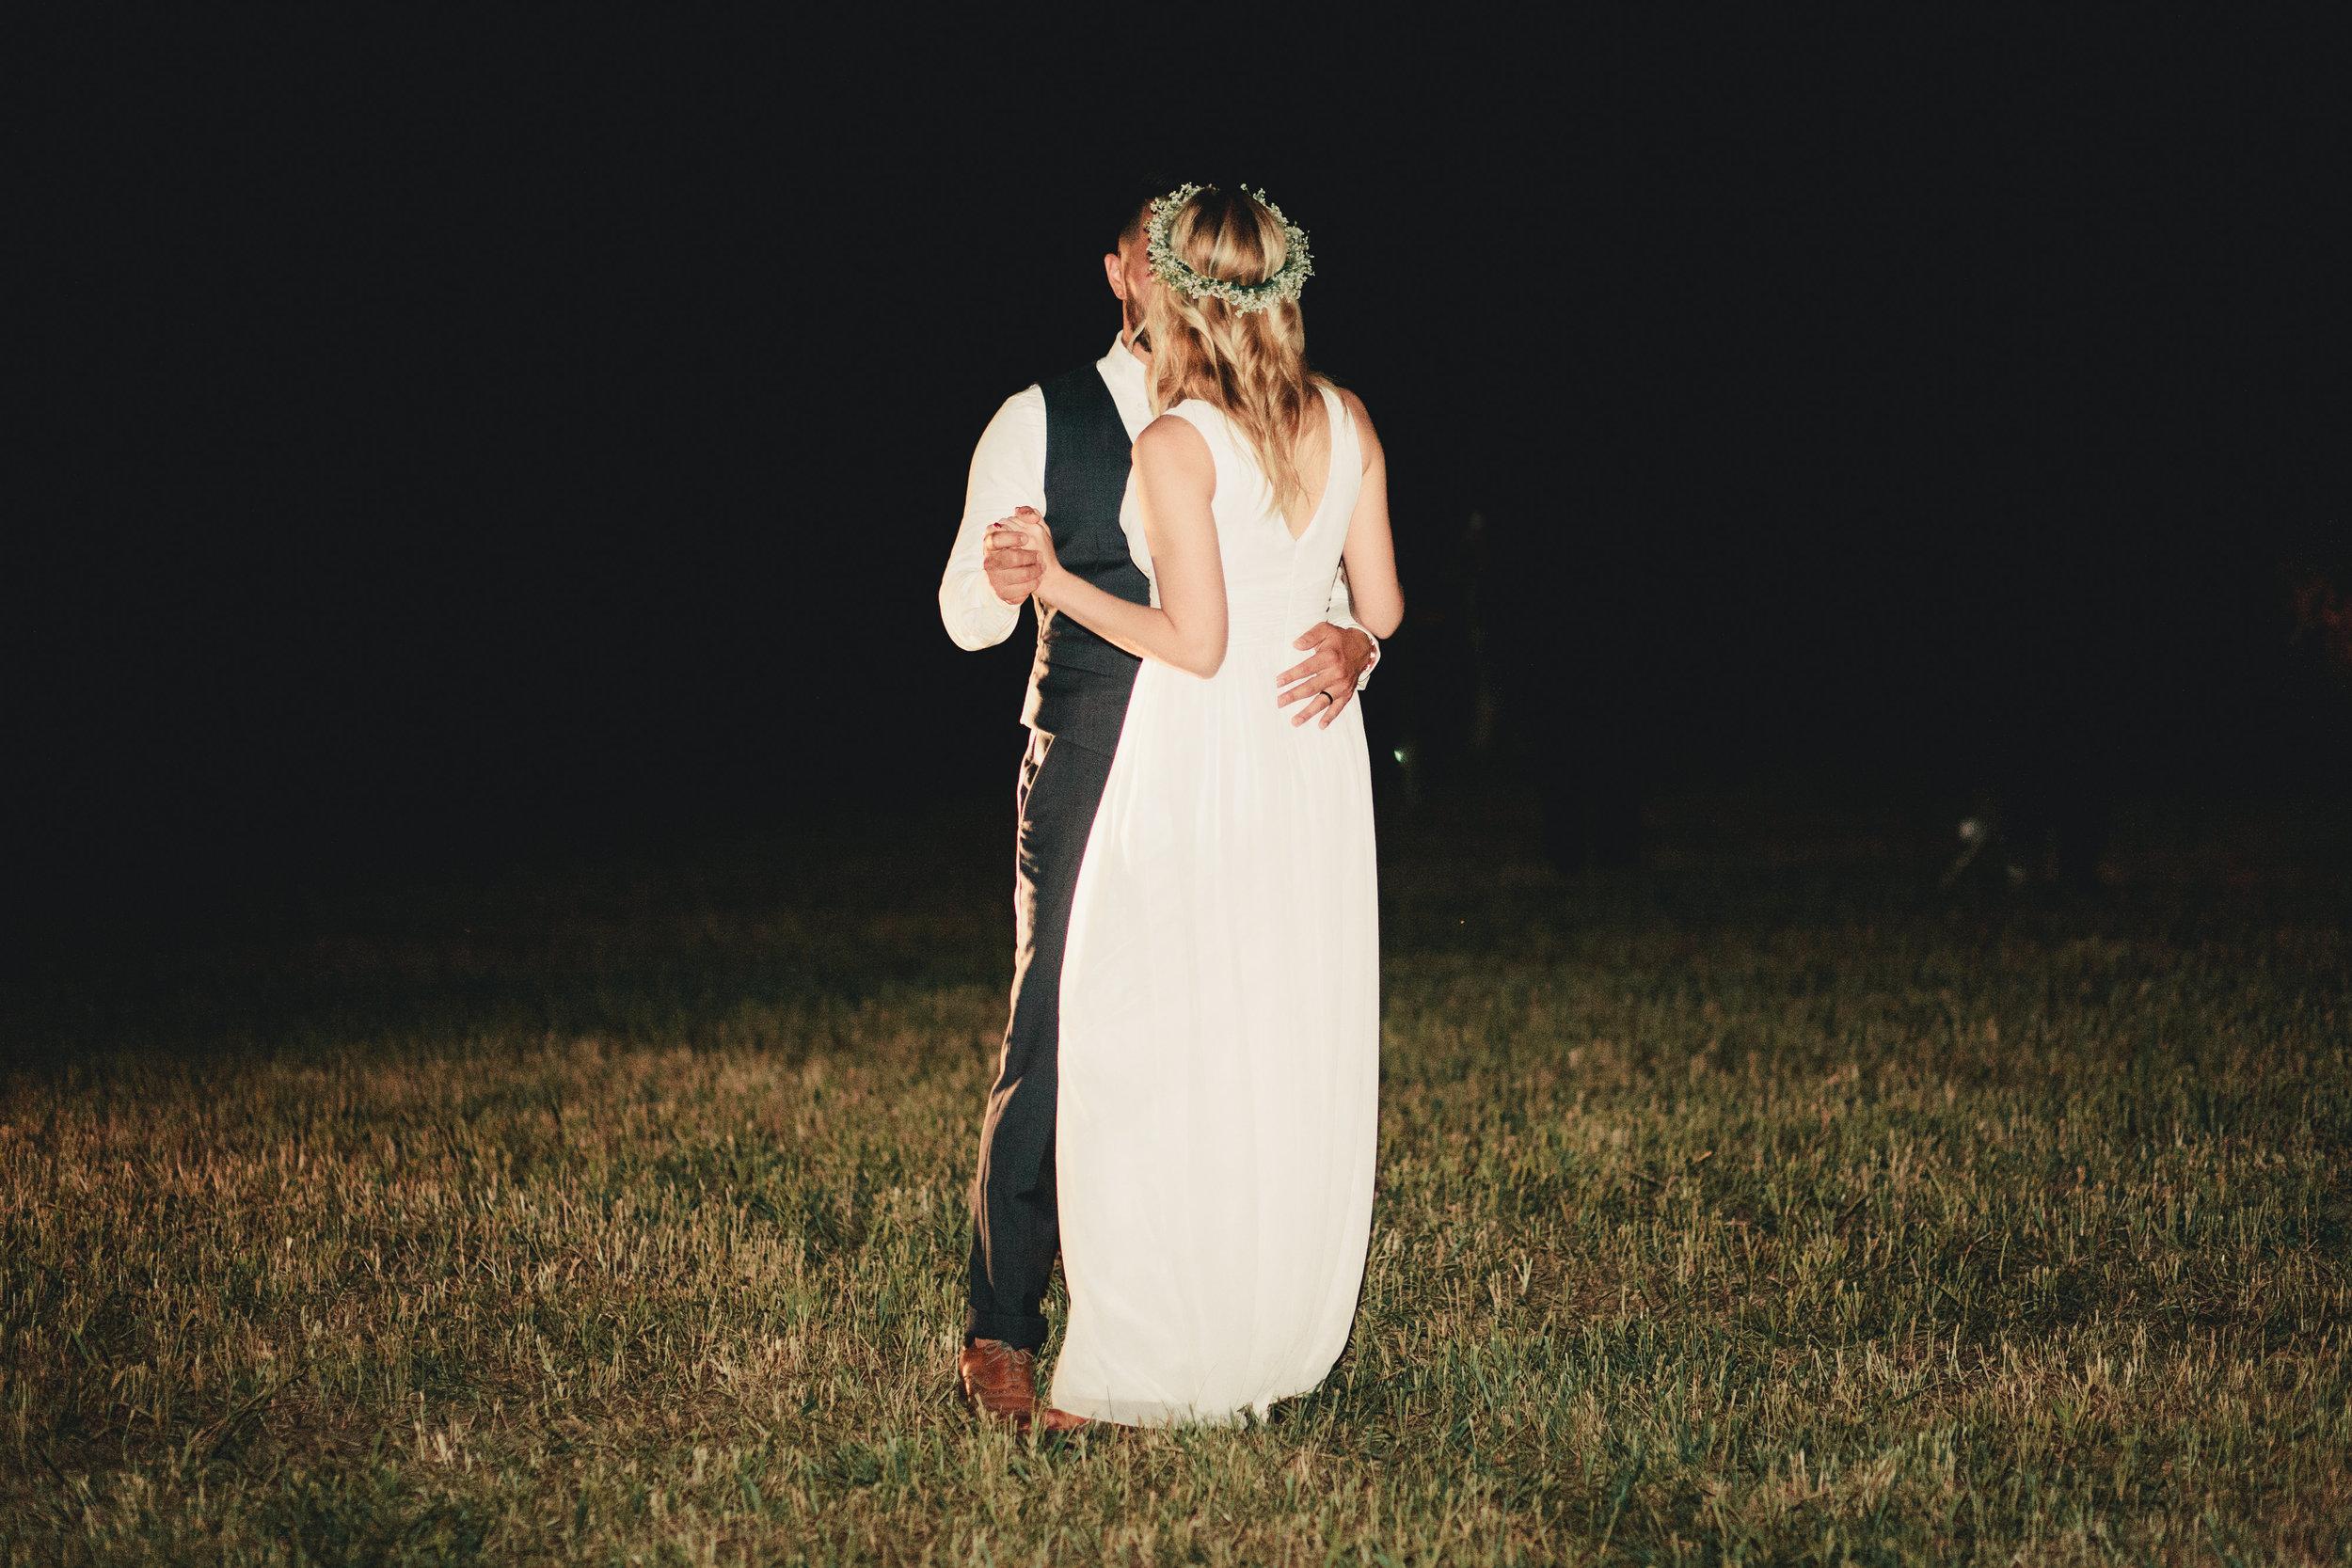 Emily and Zach-Wedding Finals 2-0256.jpg